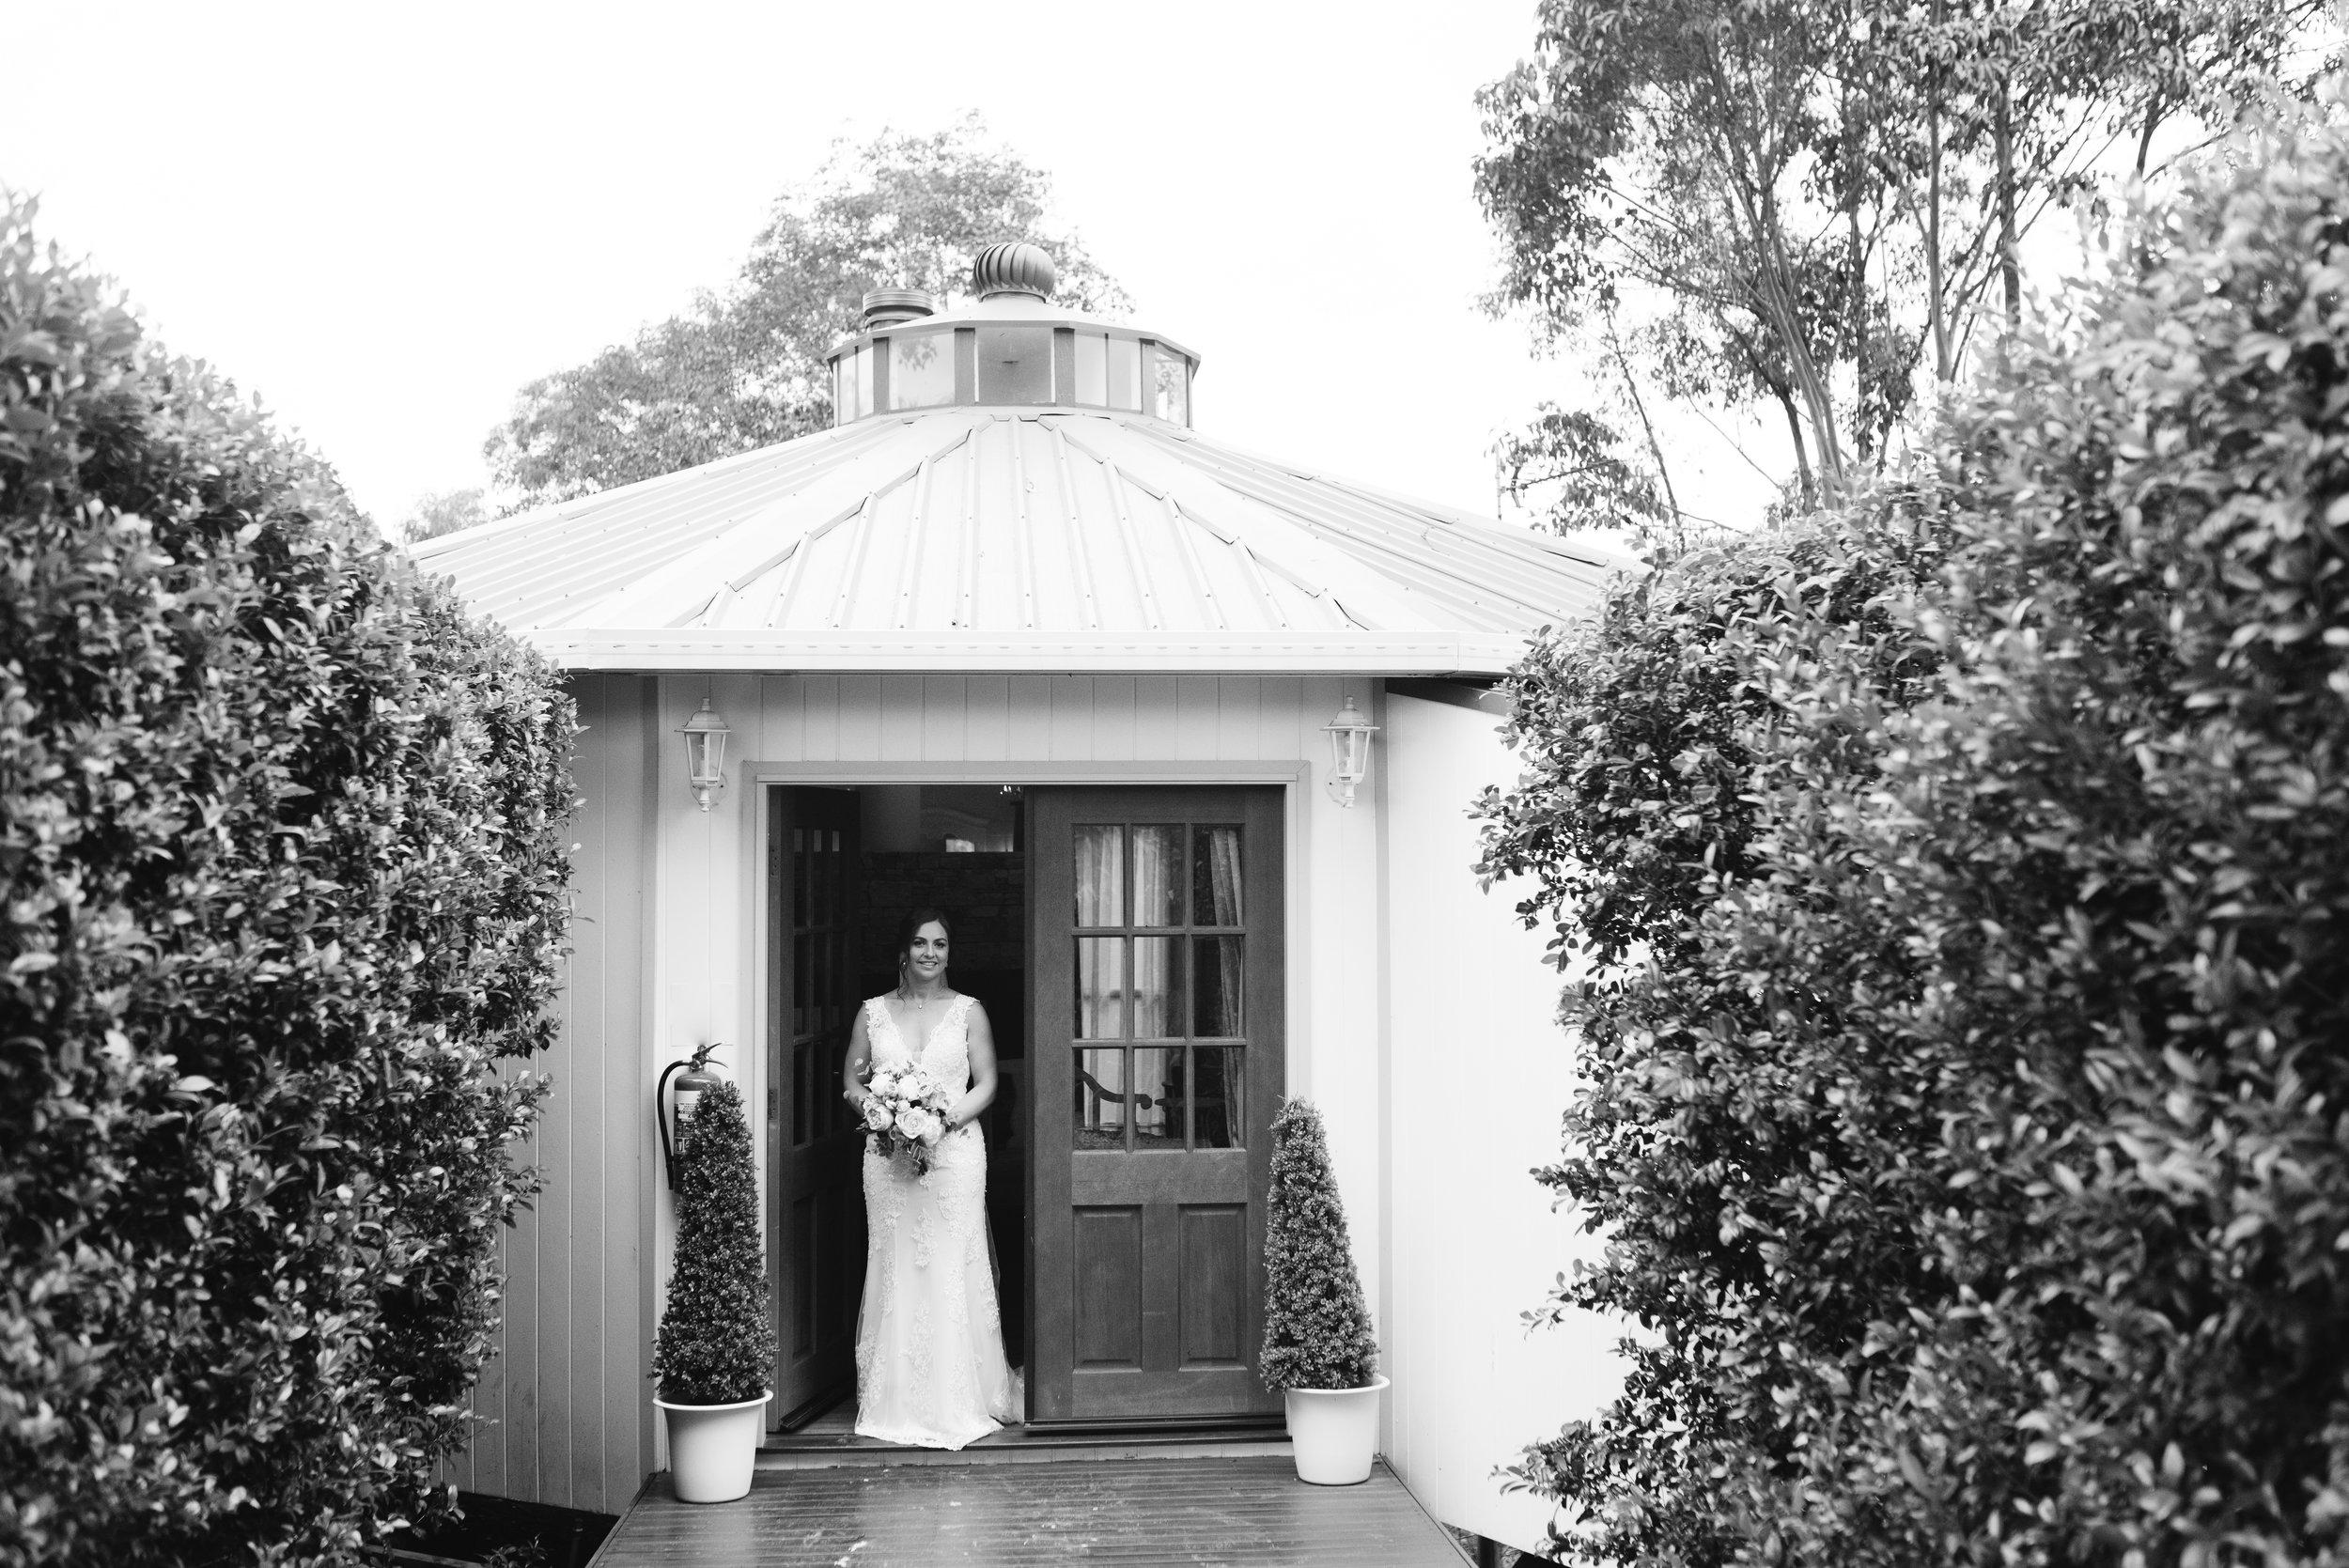 LAURENOLIVIA-austinvilla-estate-wedding-14.jpg